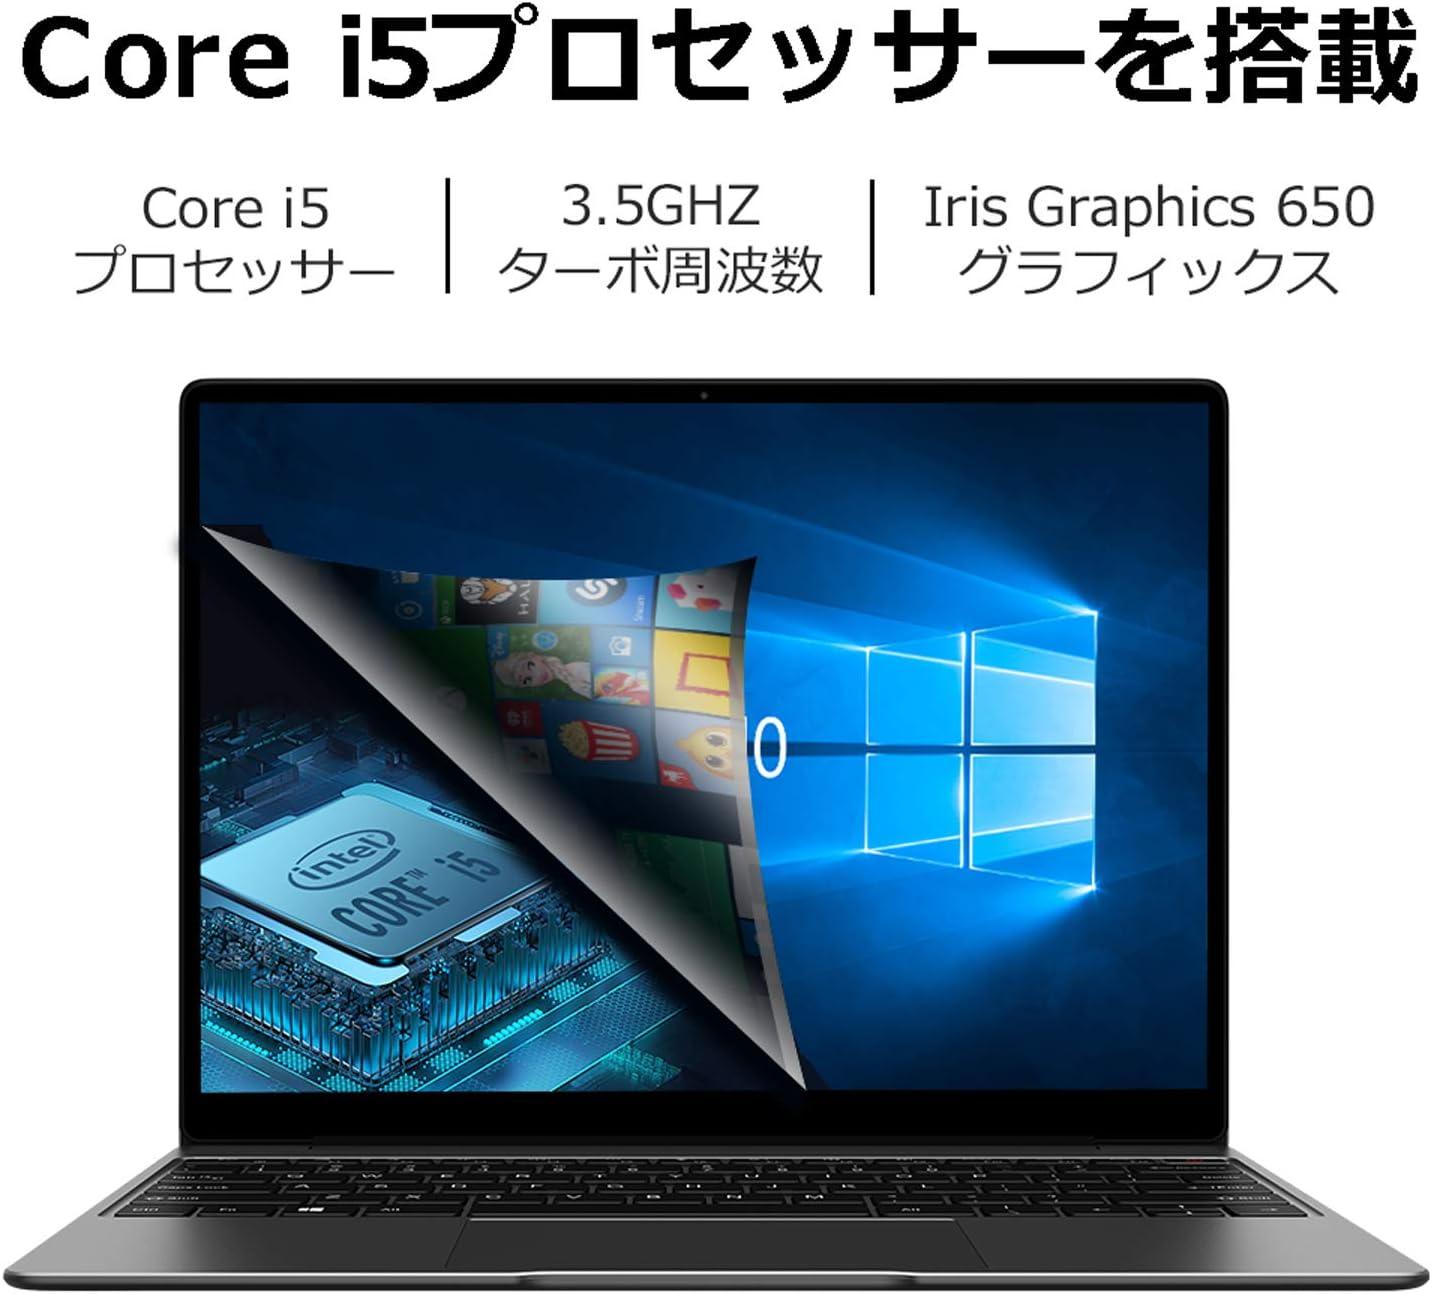 CHUWI CoreBook X ノートパソコン 14インチ 16GBメモリー 256GB SSD Core i5プロセッサー搭載 QHD/2160×1440解像度